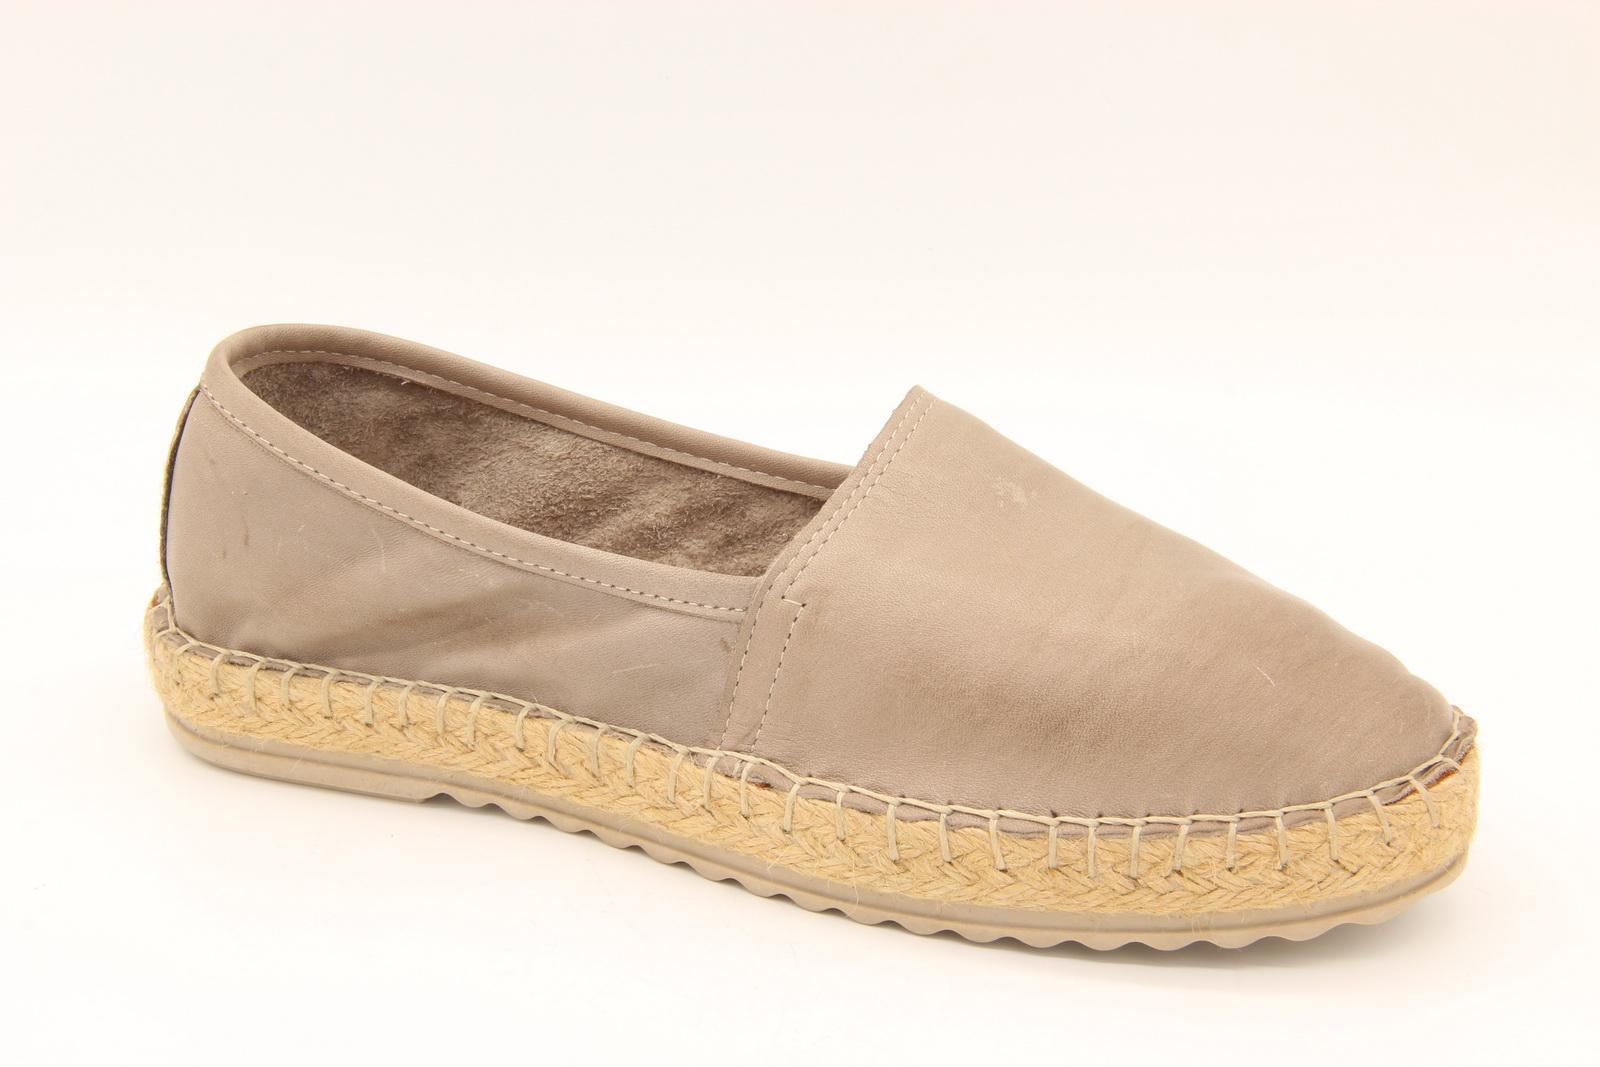 Modelli di scarpe da donna   Kardesler Kundura